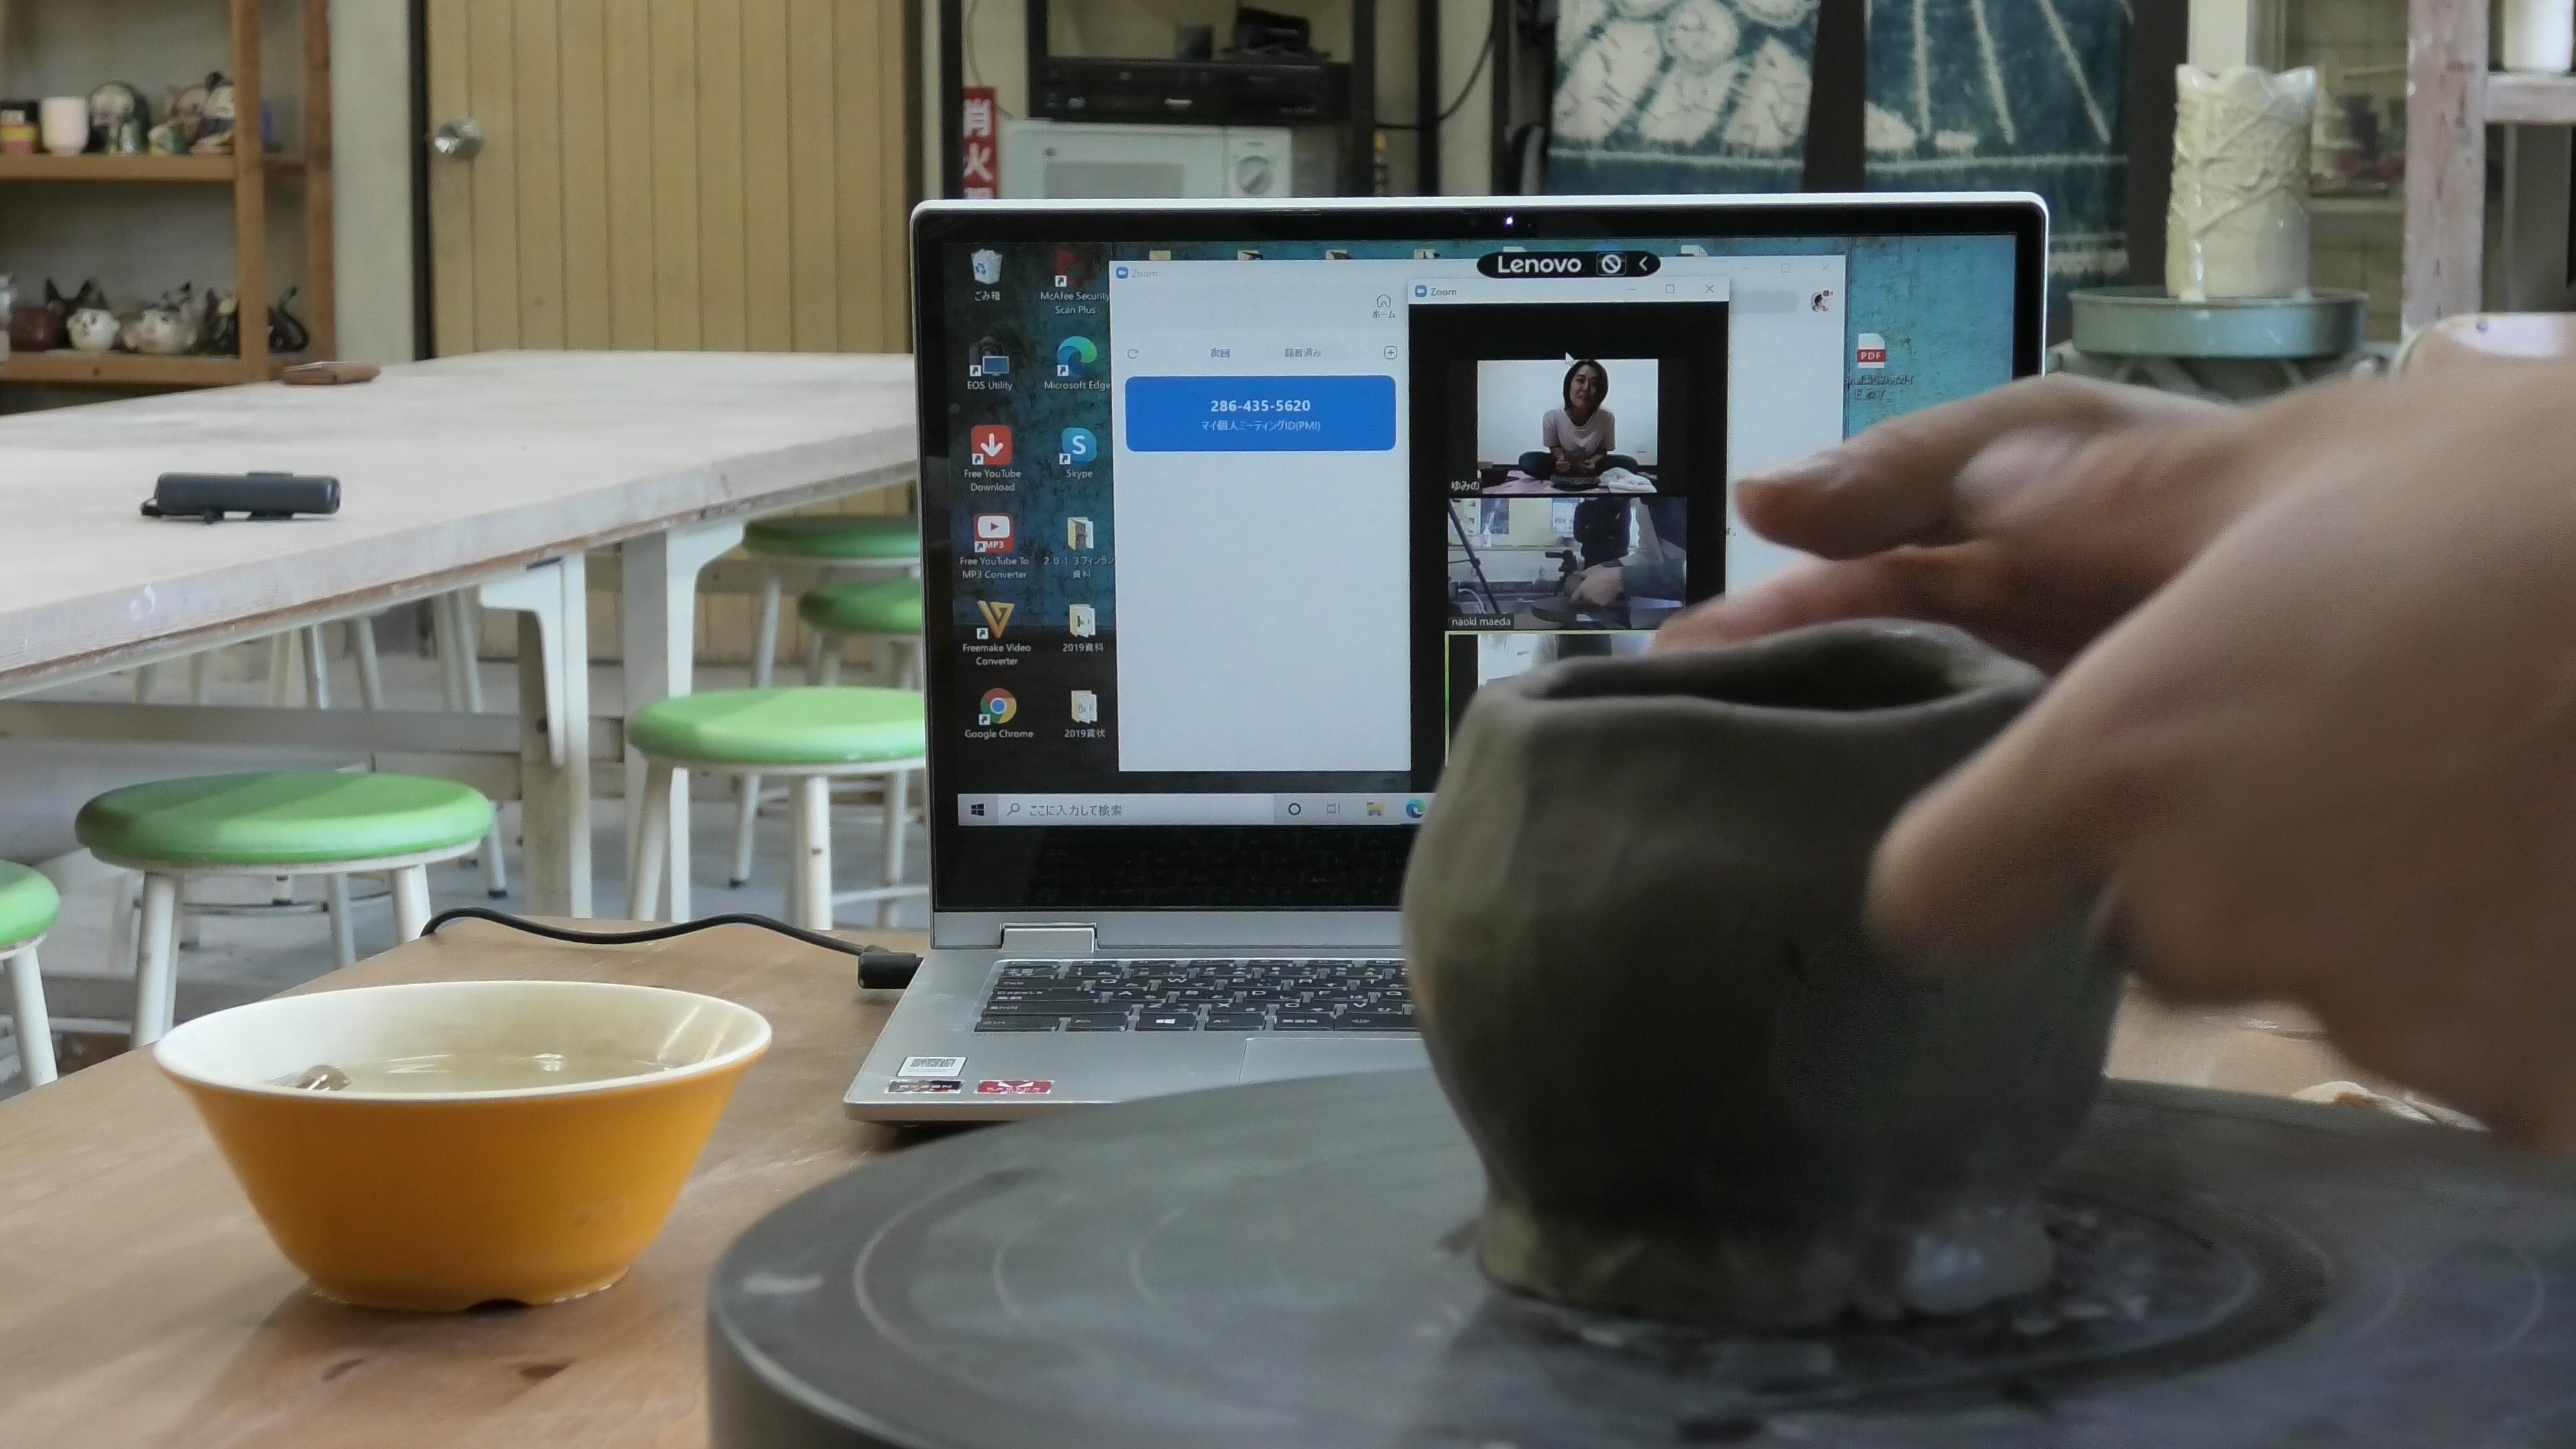 JALエンジニアリング労働組合さん主催のオンライン陶芸レクリエーション開催!